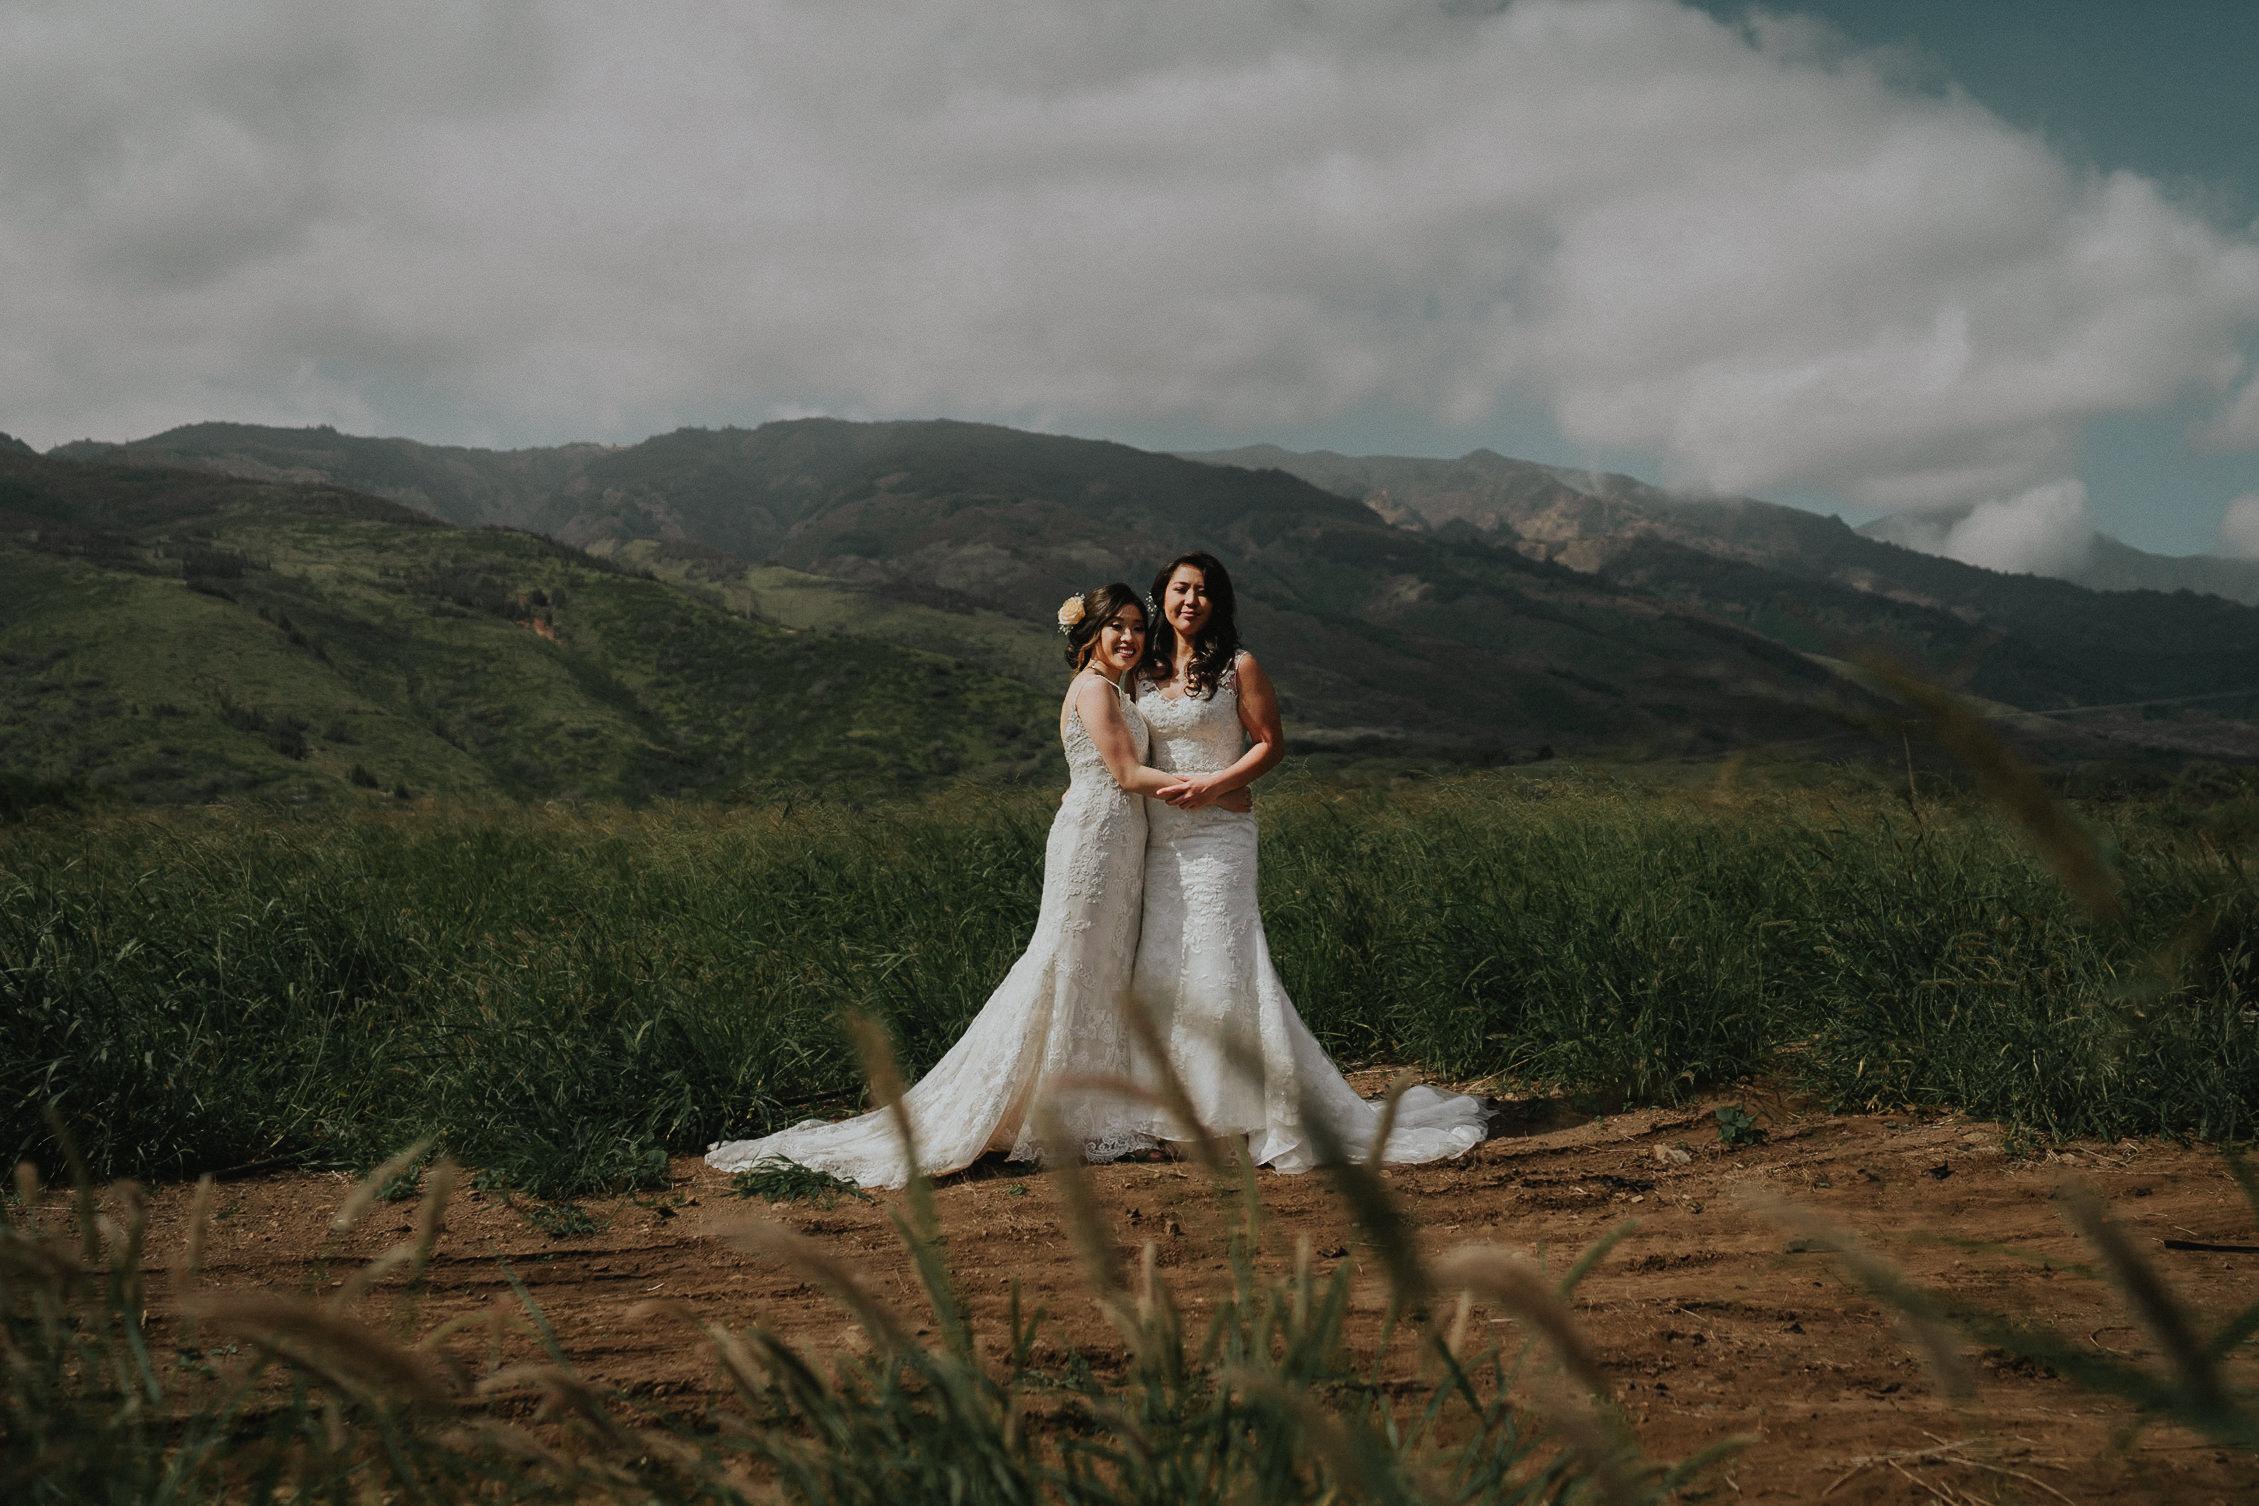 Maui_Destination_wedding_Alfred_Tang-07402.jpg